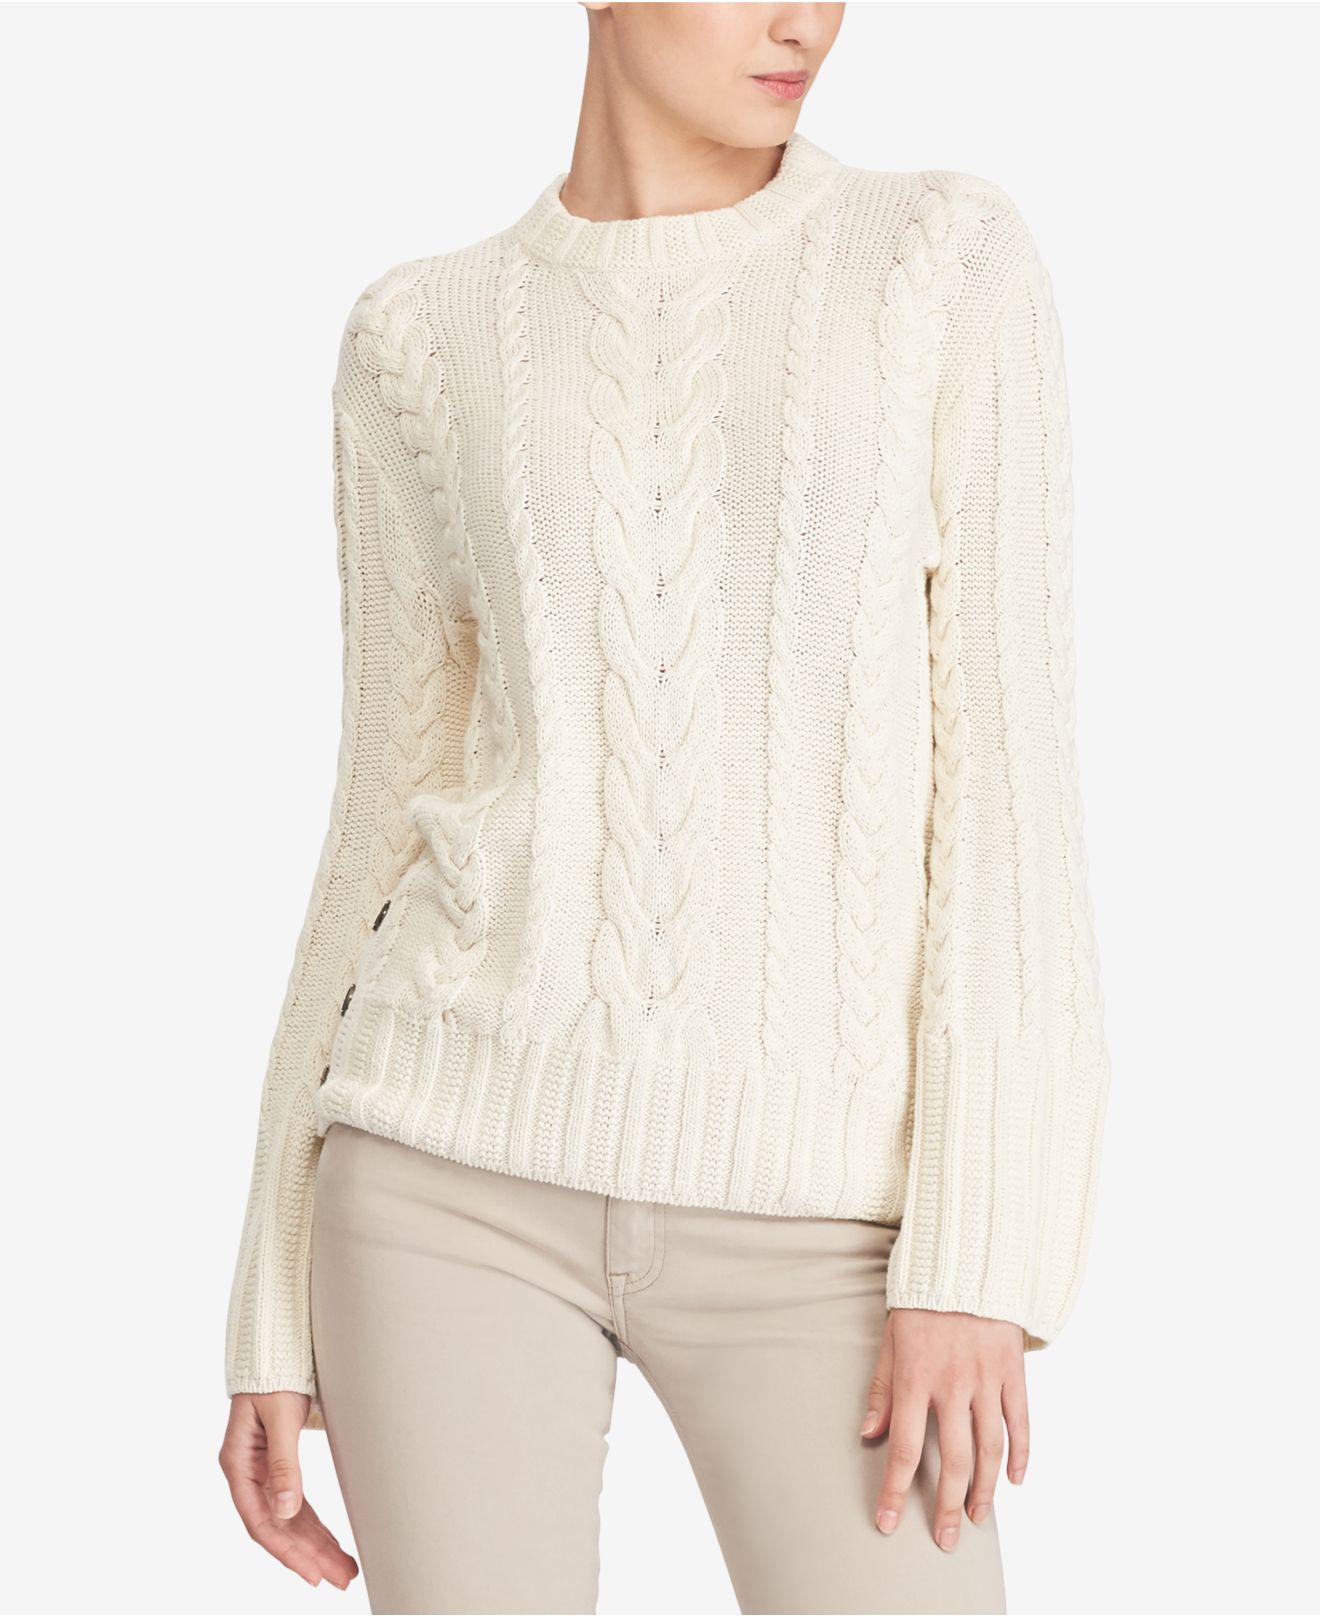 Knit Sweater Polo Ralph Dolman Natural Aran Lauren IY9EHWD2